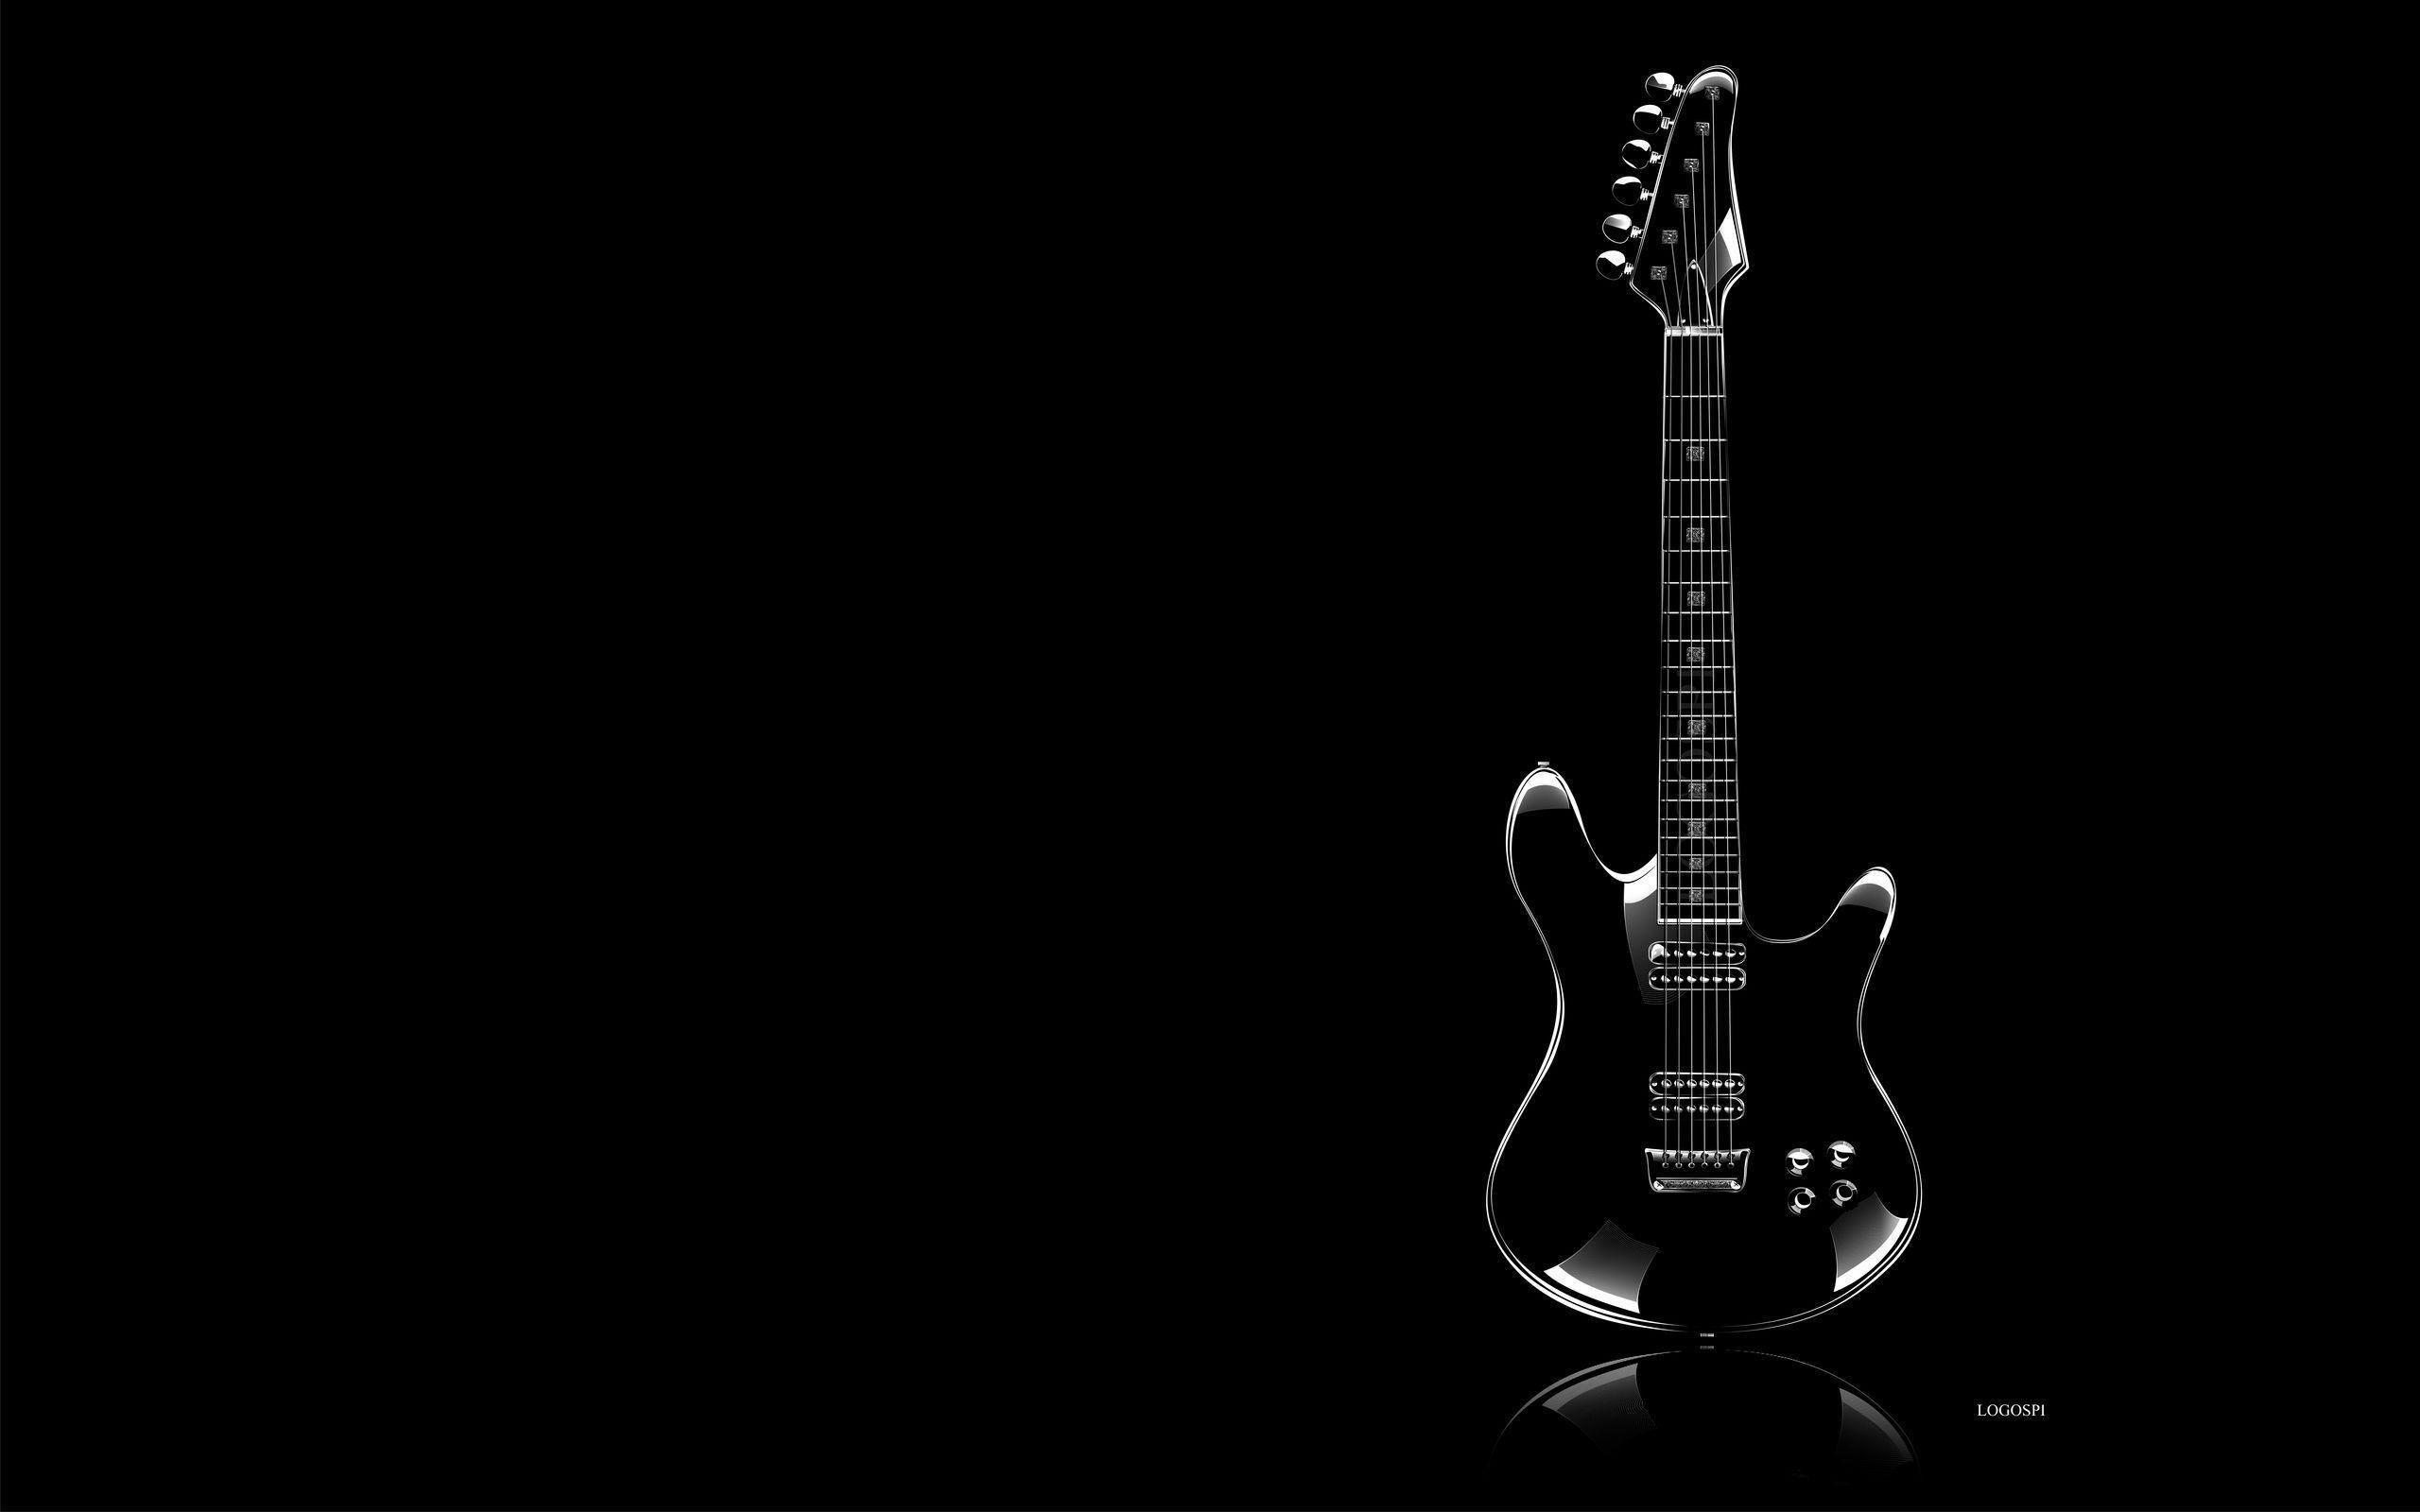 Guitar Black Background 48 images 2560x1600